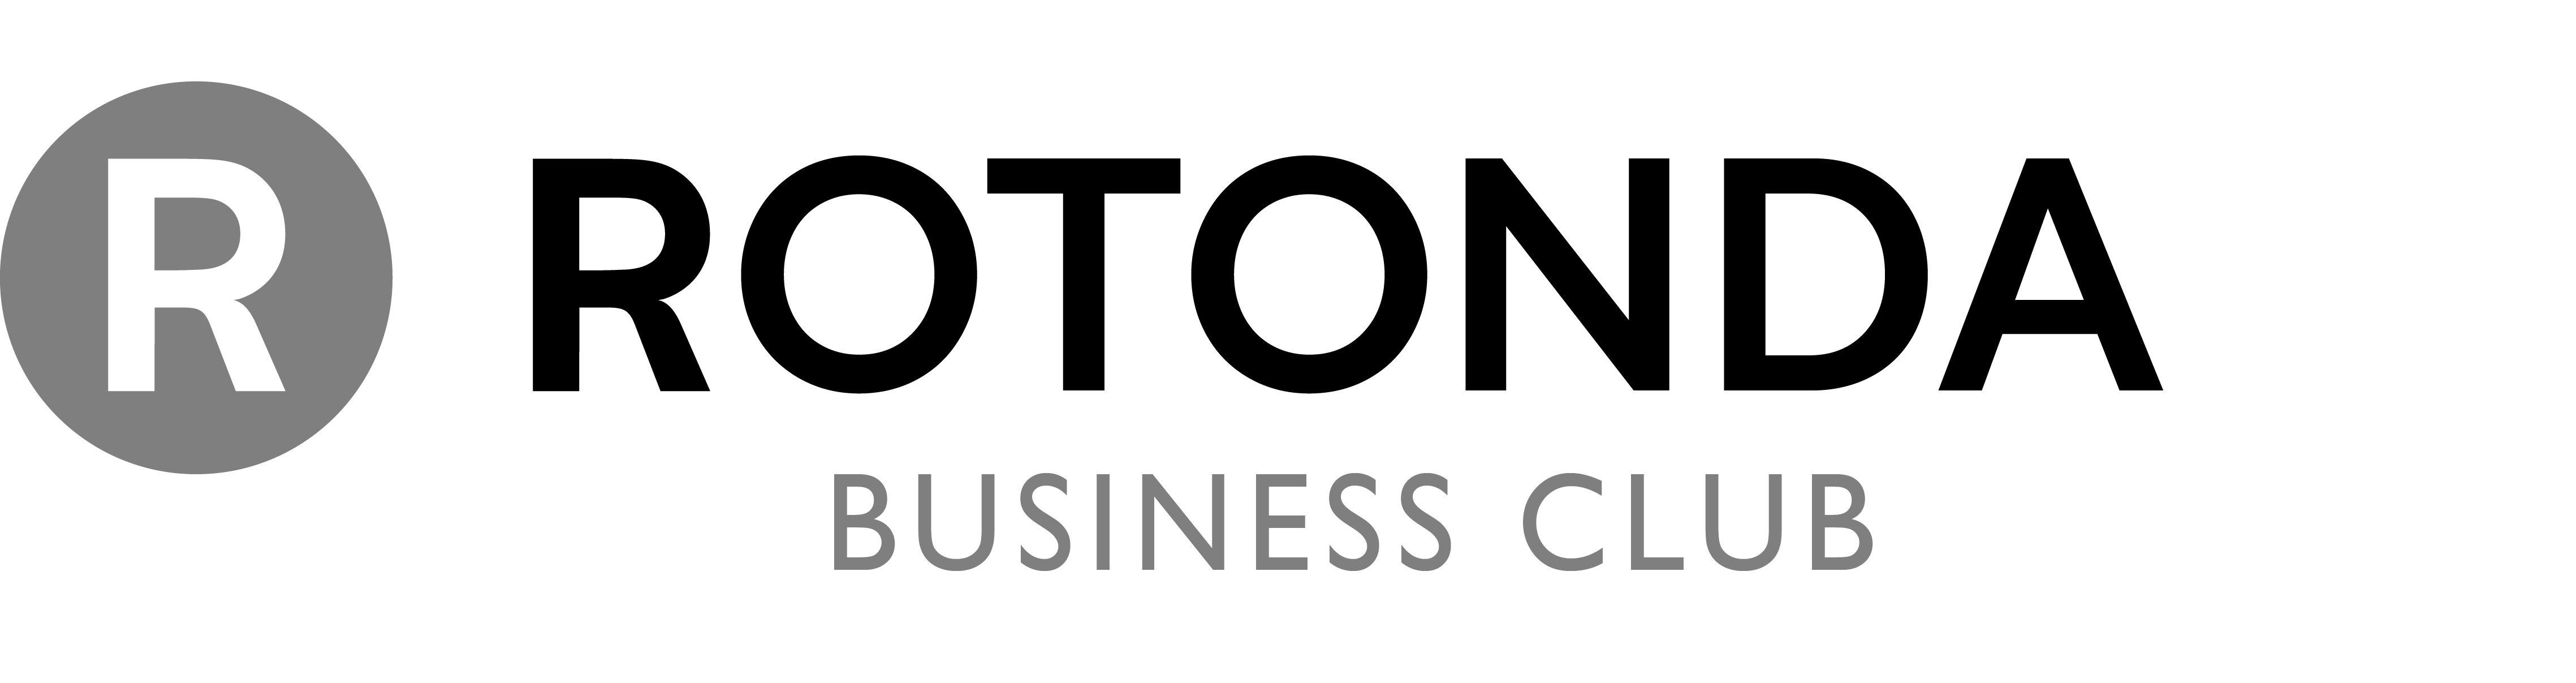 Rotonda Business Club